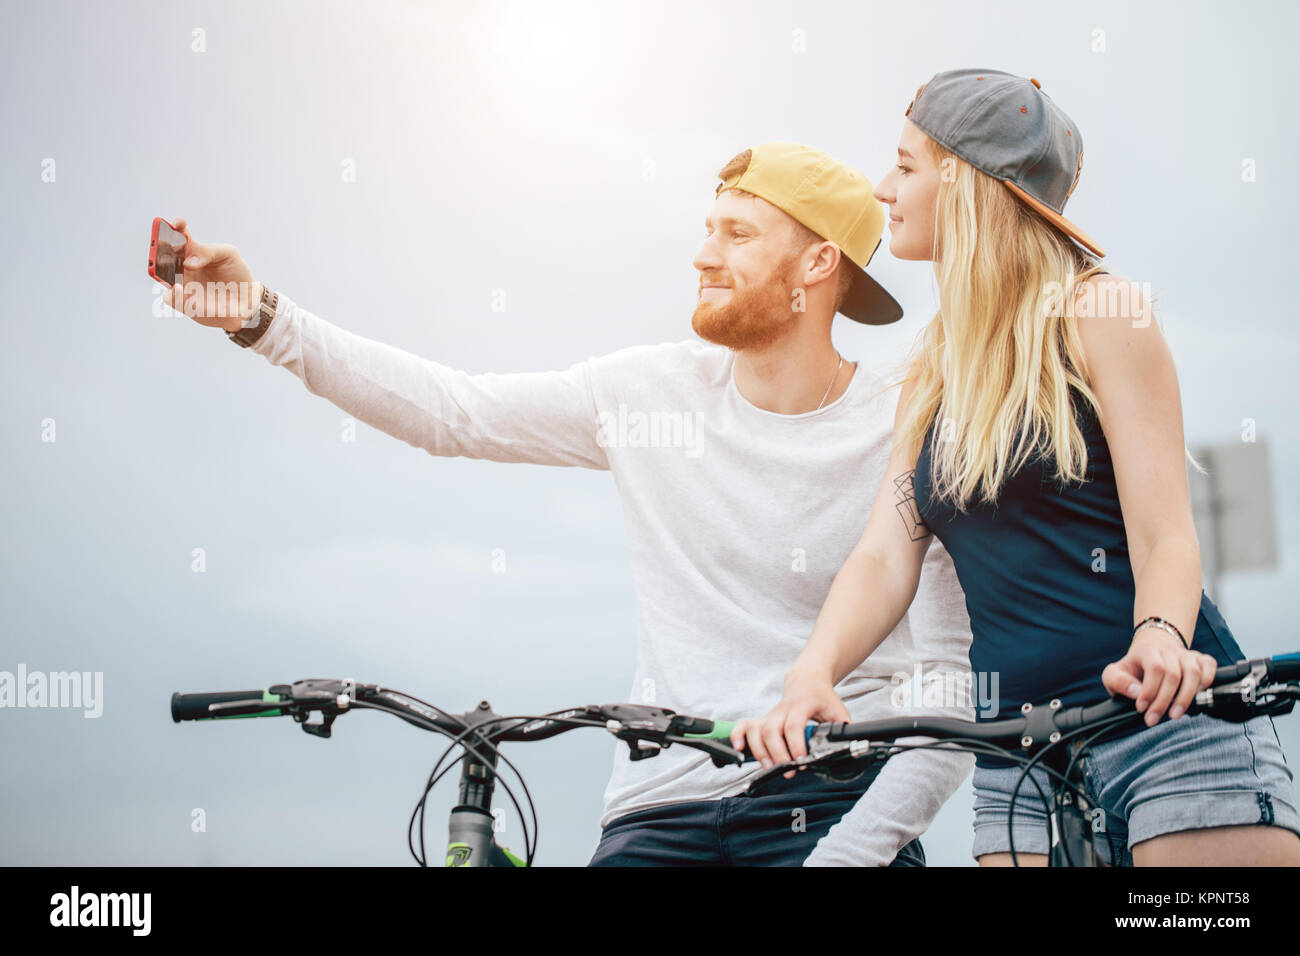 Feliz pareja con bicicleta teniendo selfie afuera Imagen De Stock